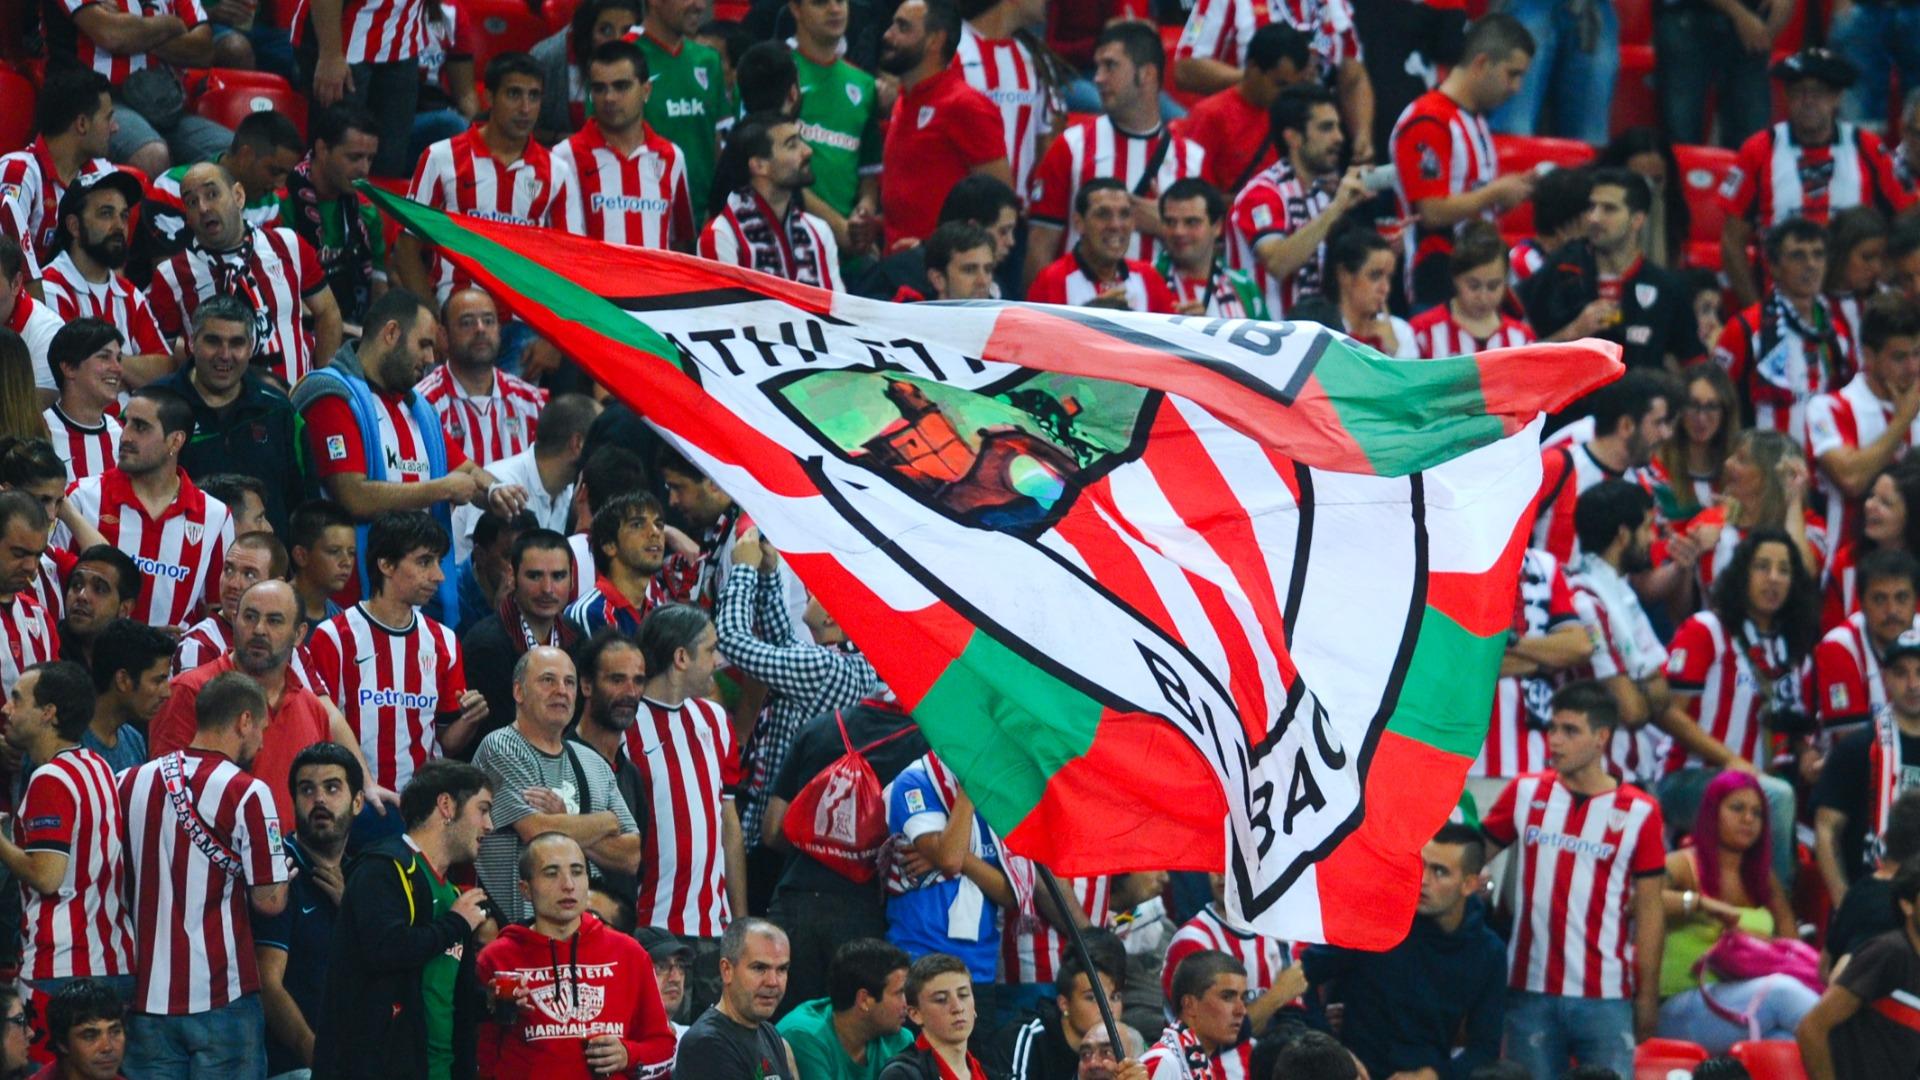 Real Sociedad v Athletic Bilbao: Unique derby offers momentous 'phantom' final for reinvigorated Copa